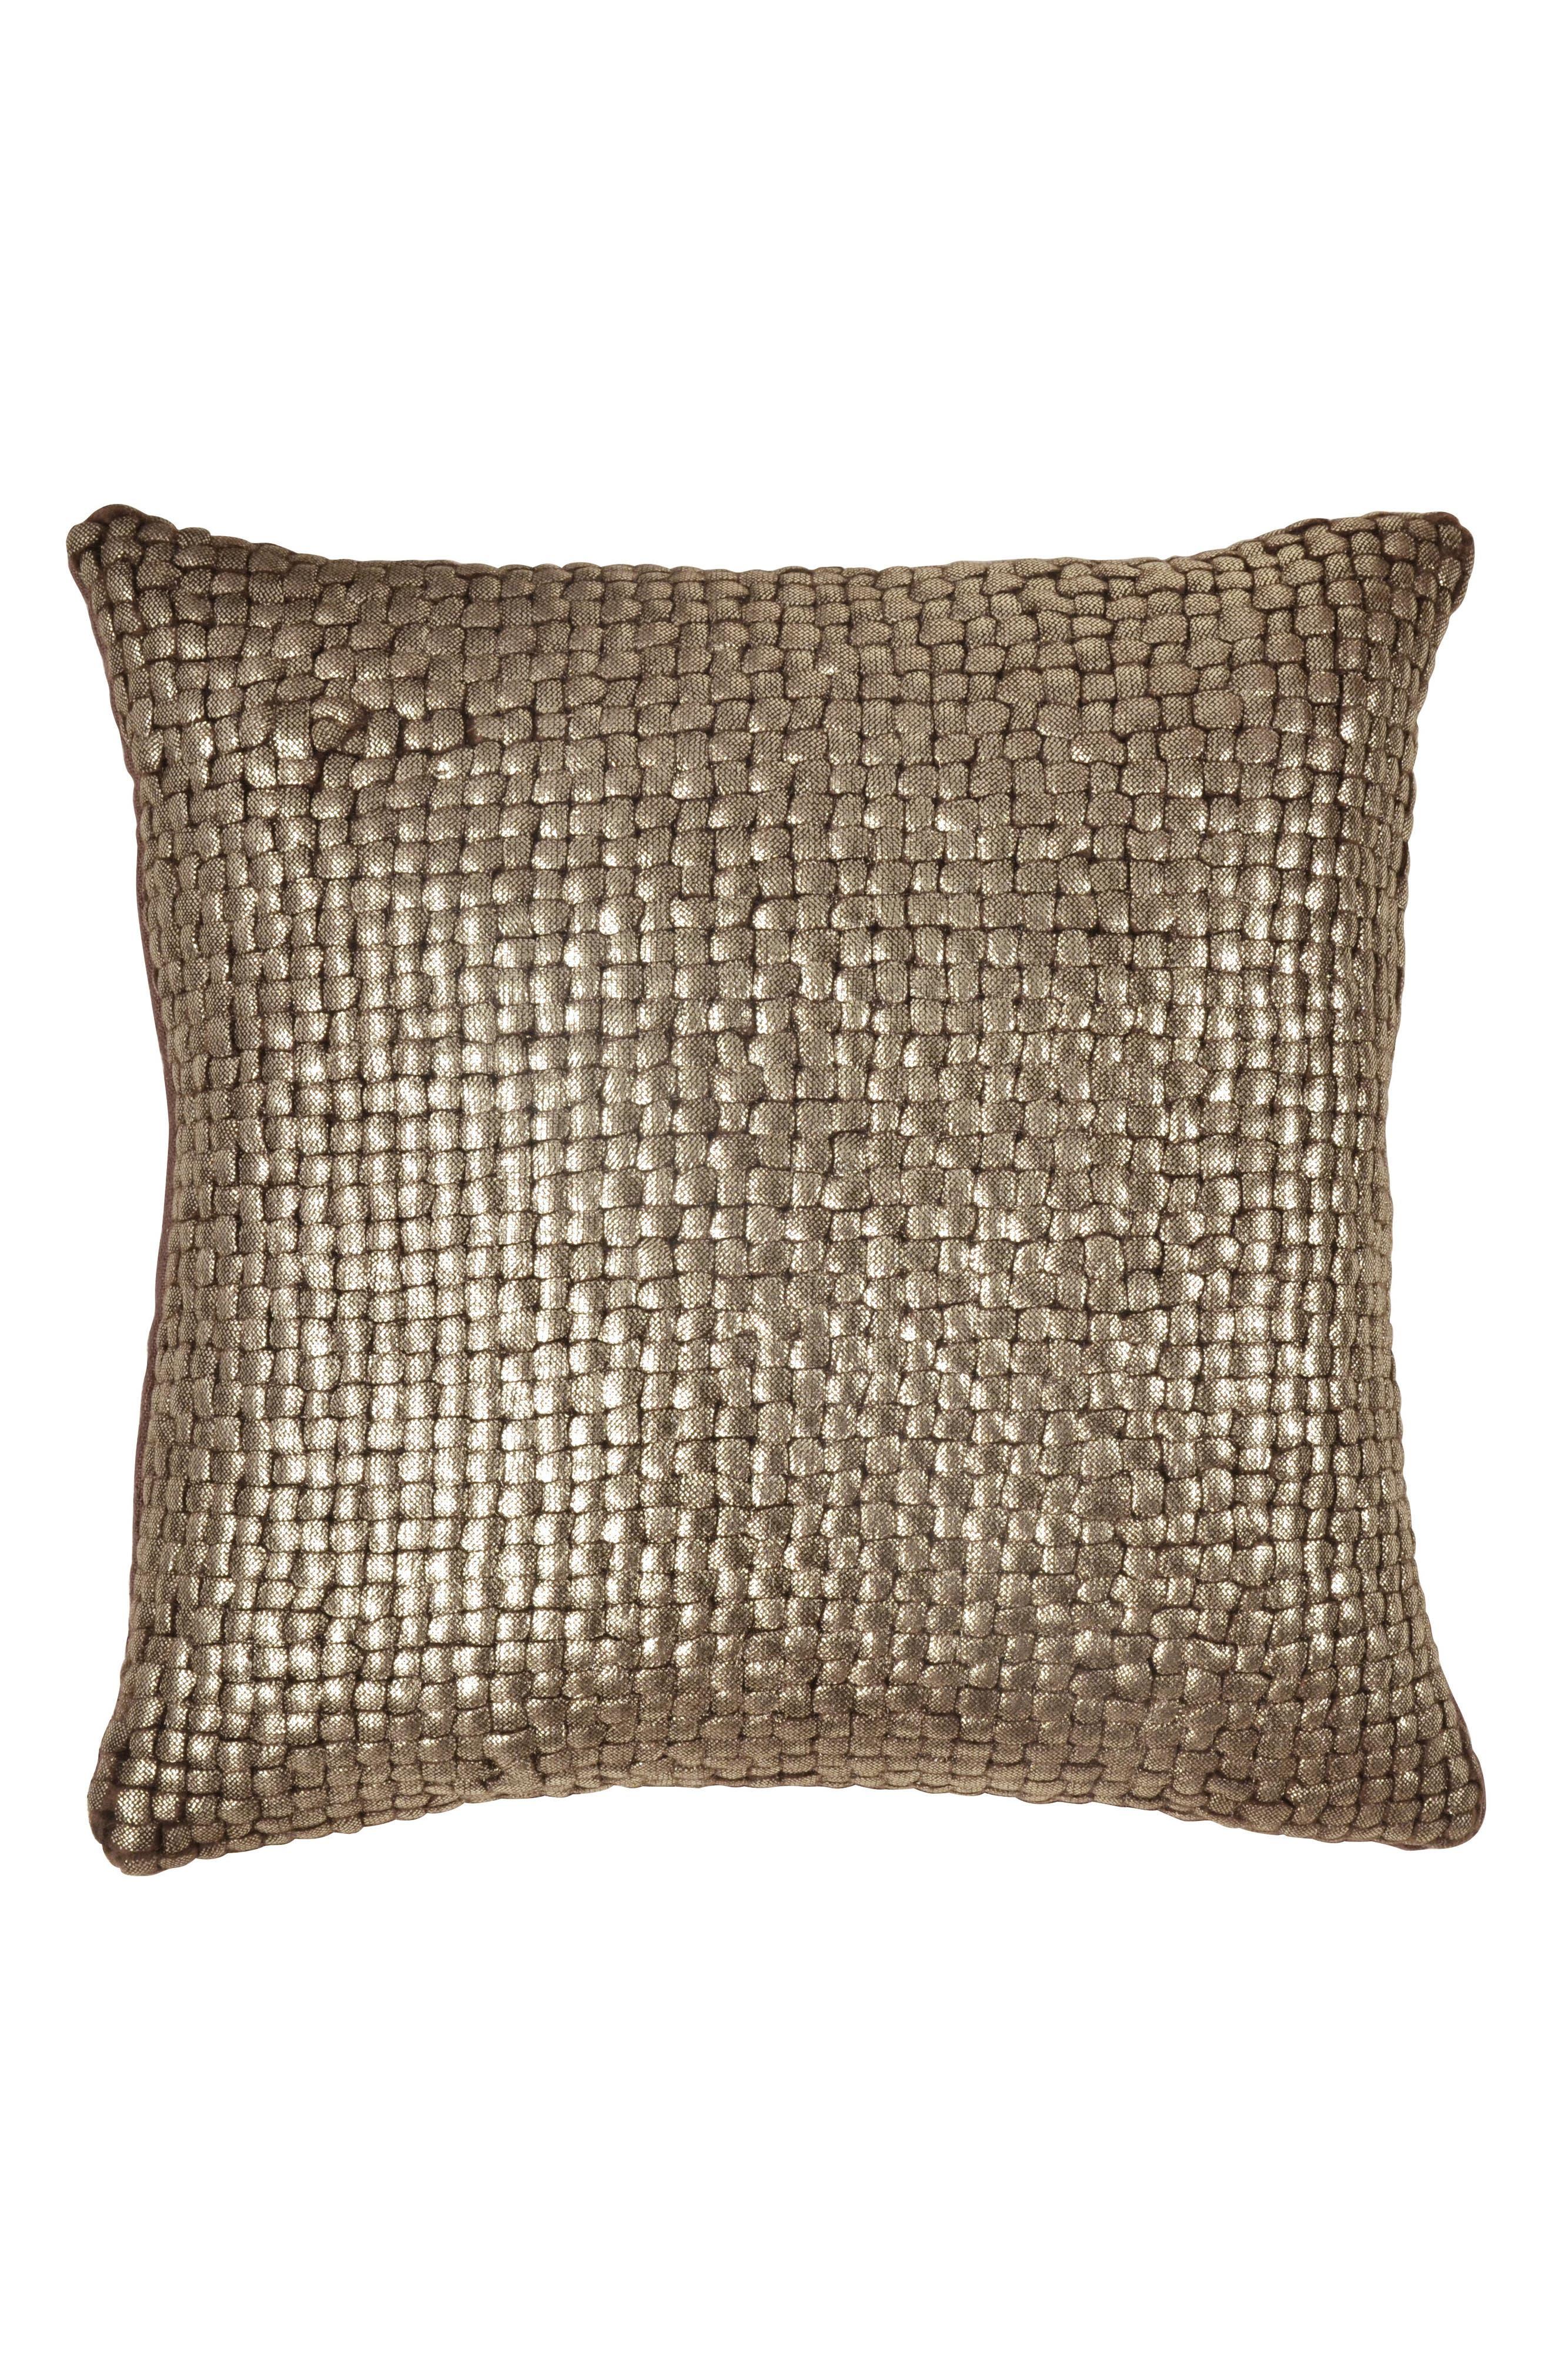 MICHAEL ARAM,                             Metallic Basket Weave Accent Pillow,                             Main thumbnail 1, color,                             CHOCOLATE